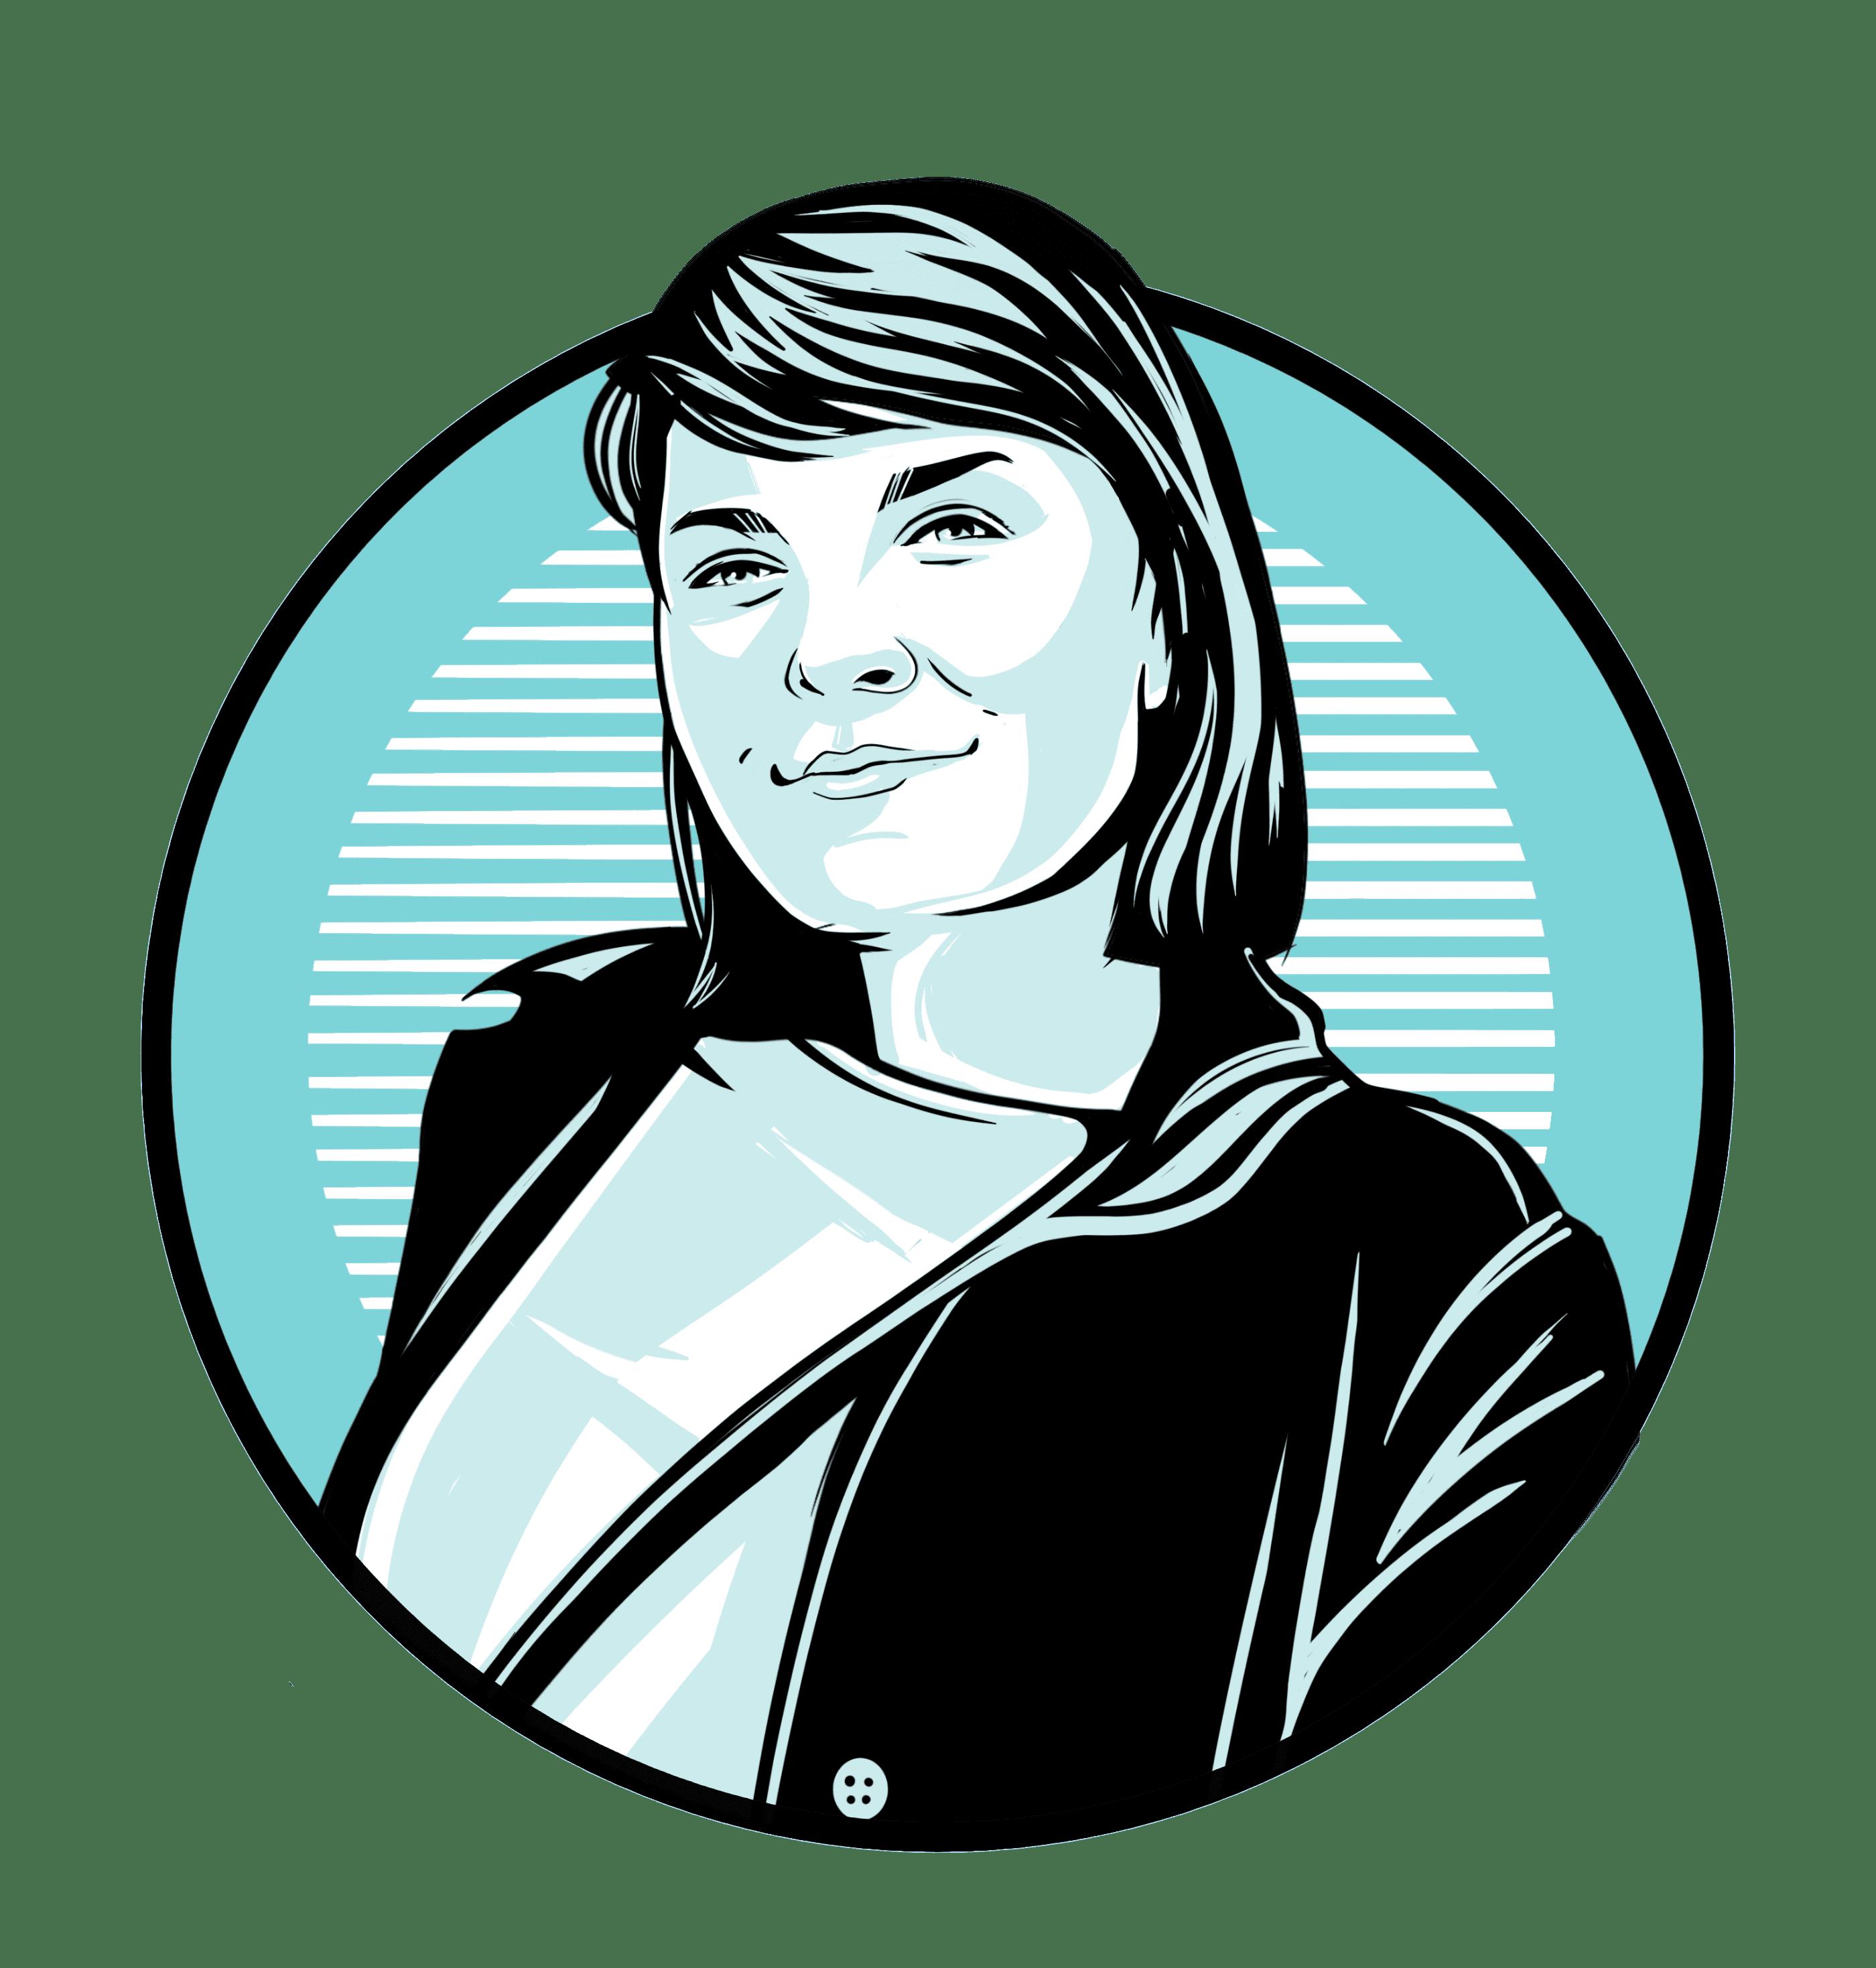 Caricature of Mariah Cowsert